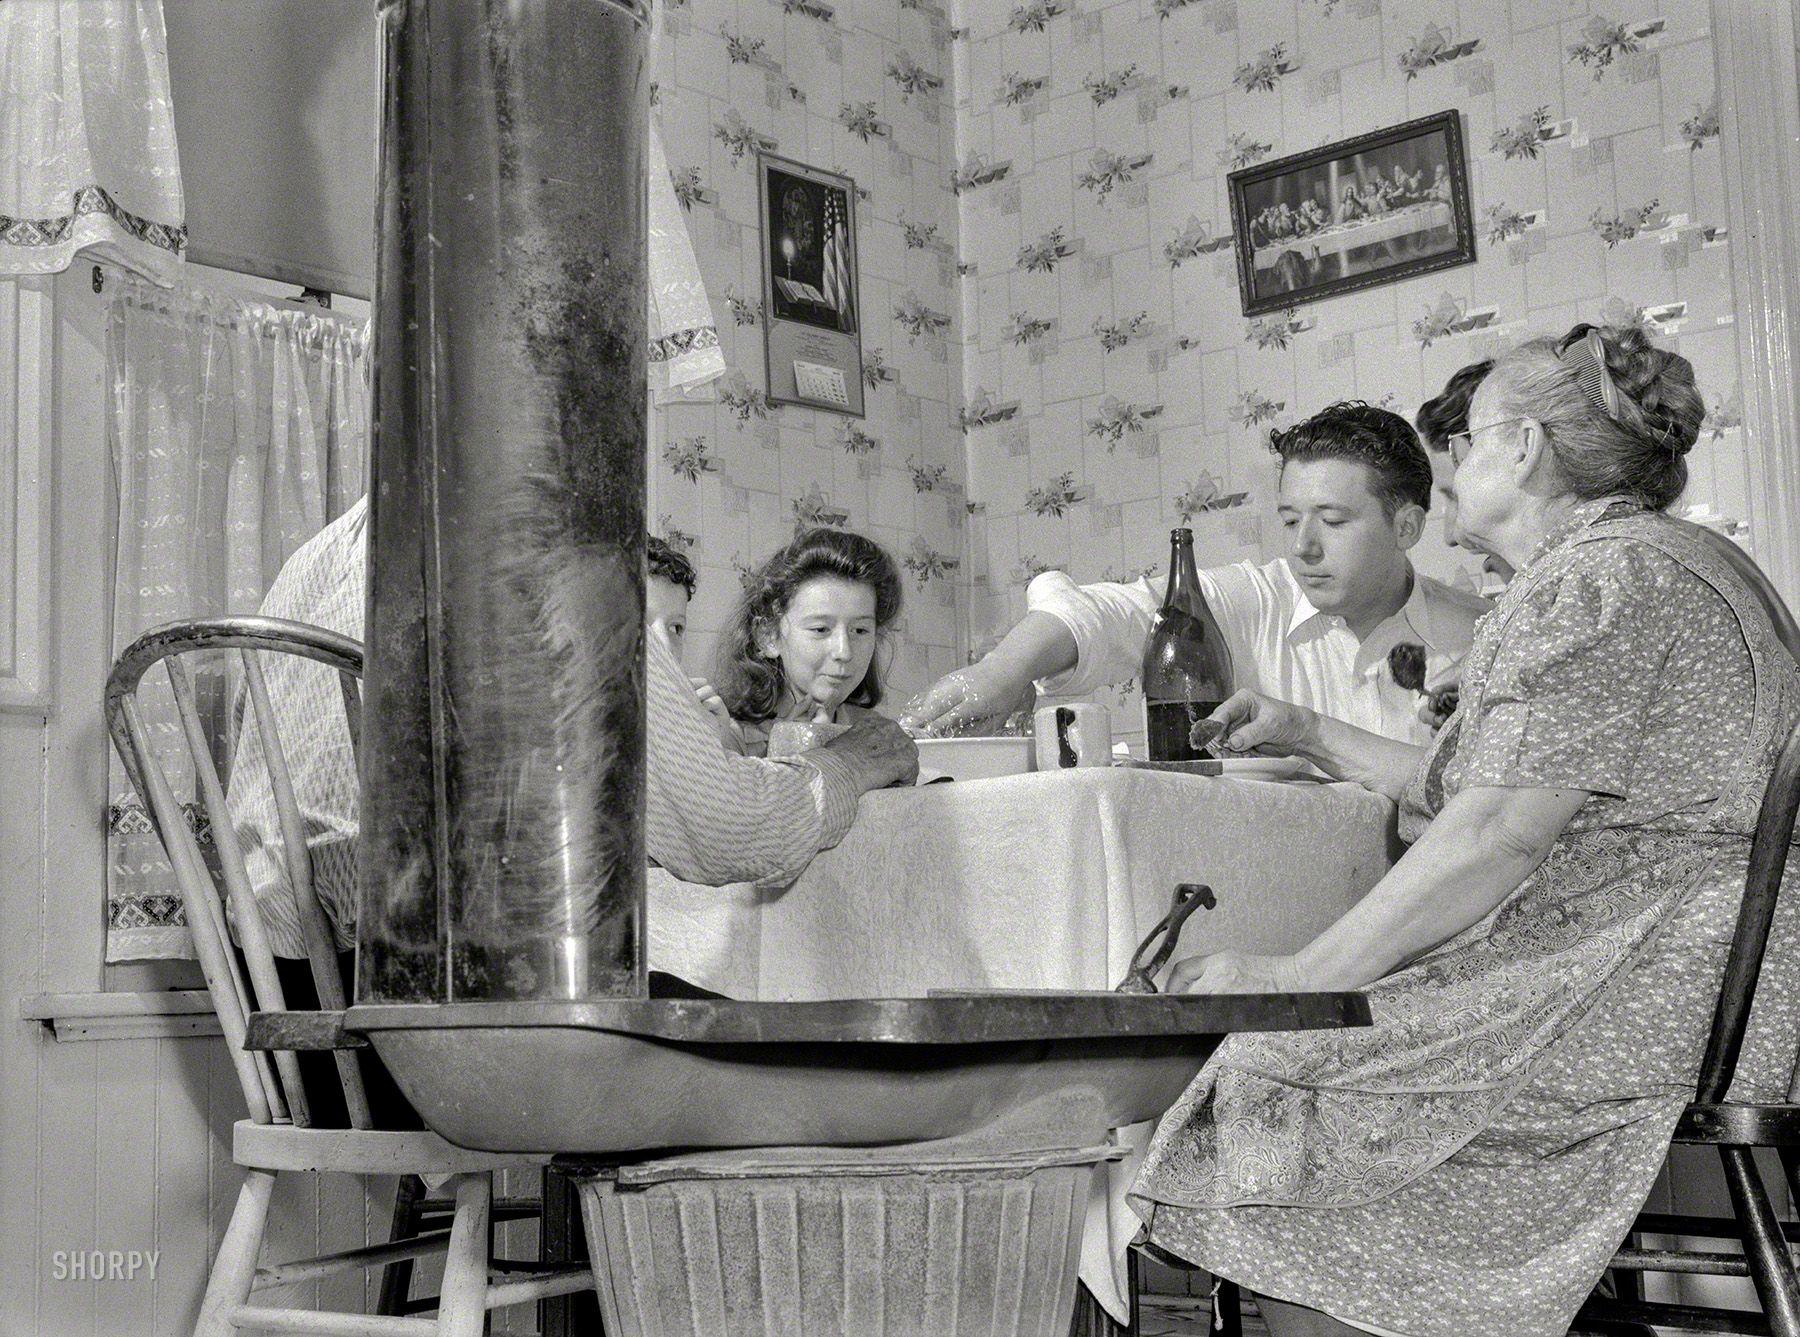 Shorpy Historic Picture Archive :: Check Coolant: 1939